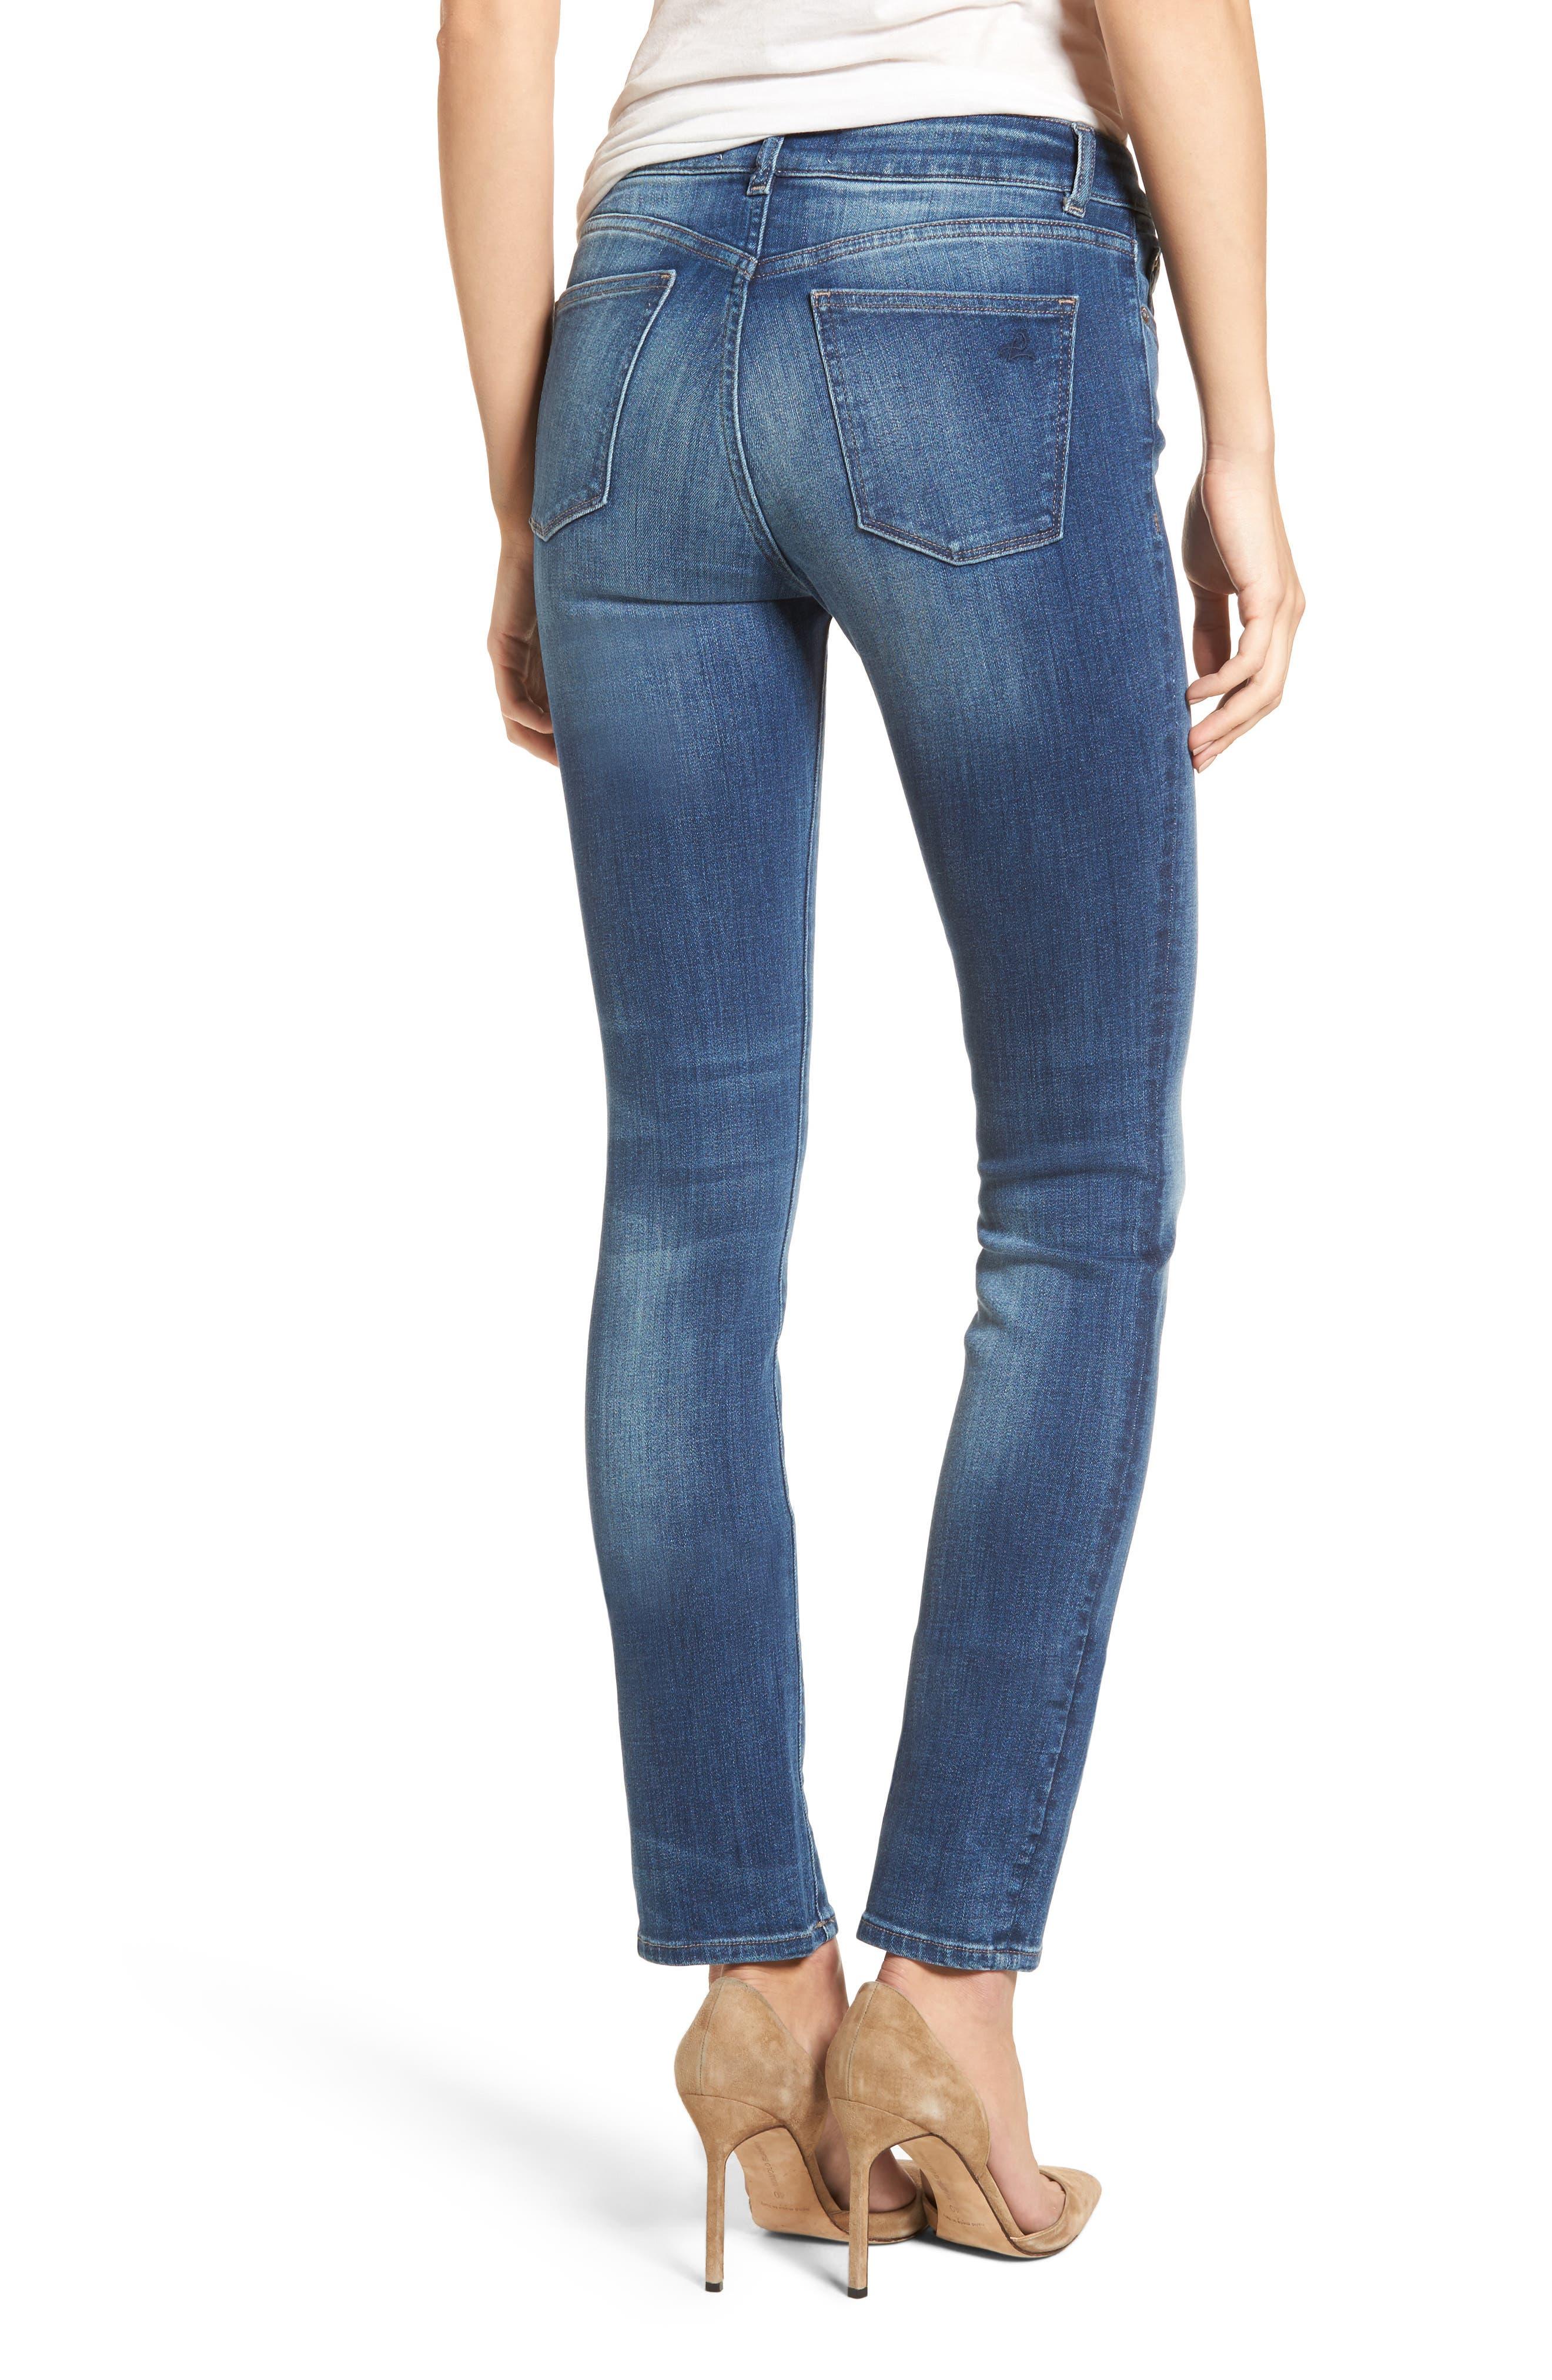 Mara Straight Leg Jeans,                             Alternate thumbnail 2, color,                             425